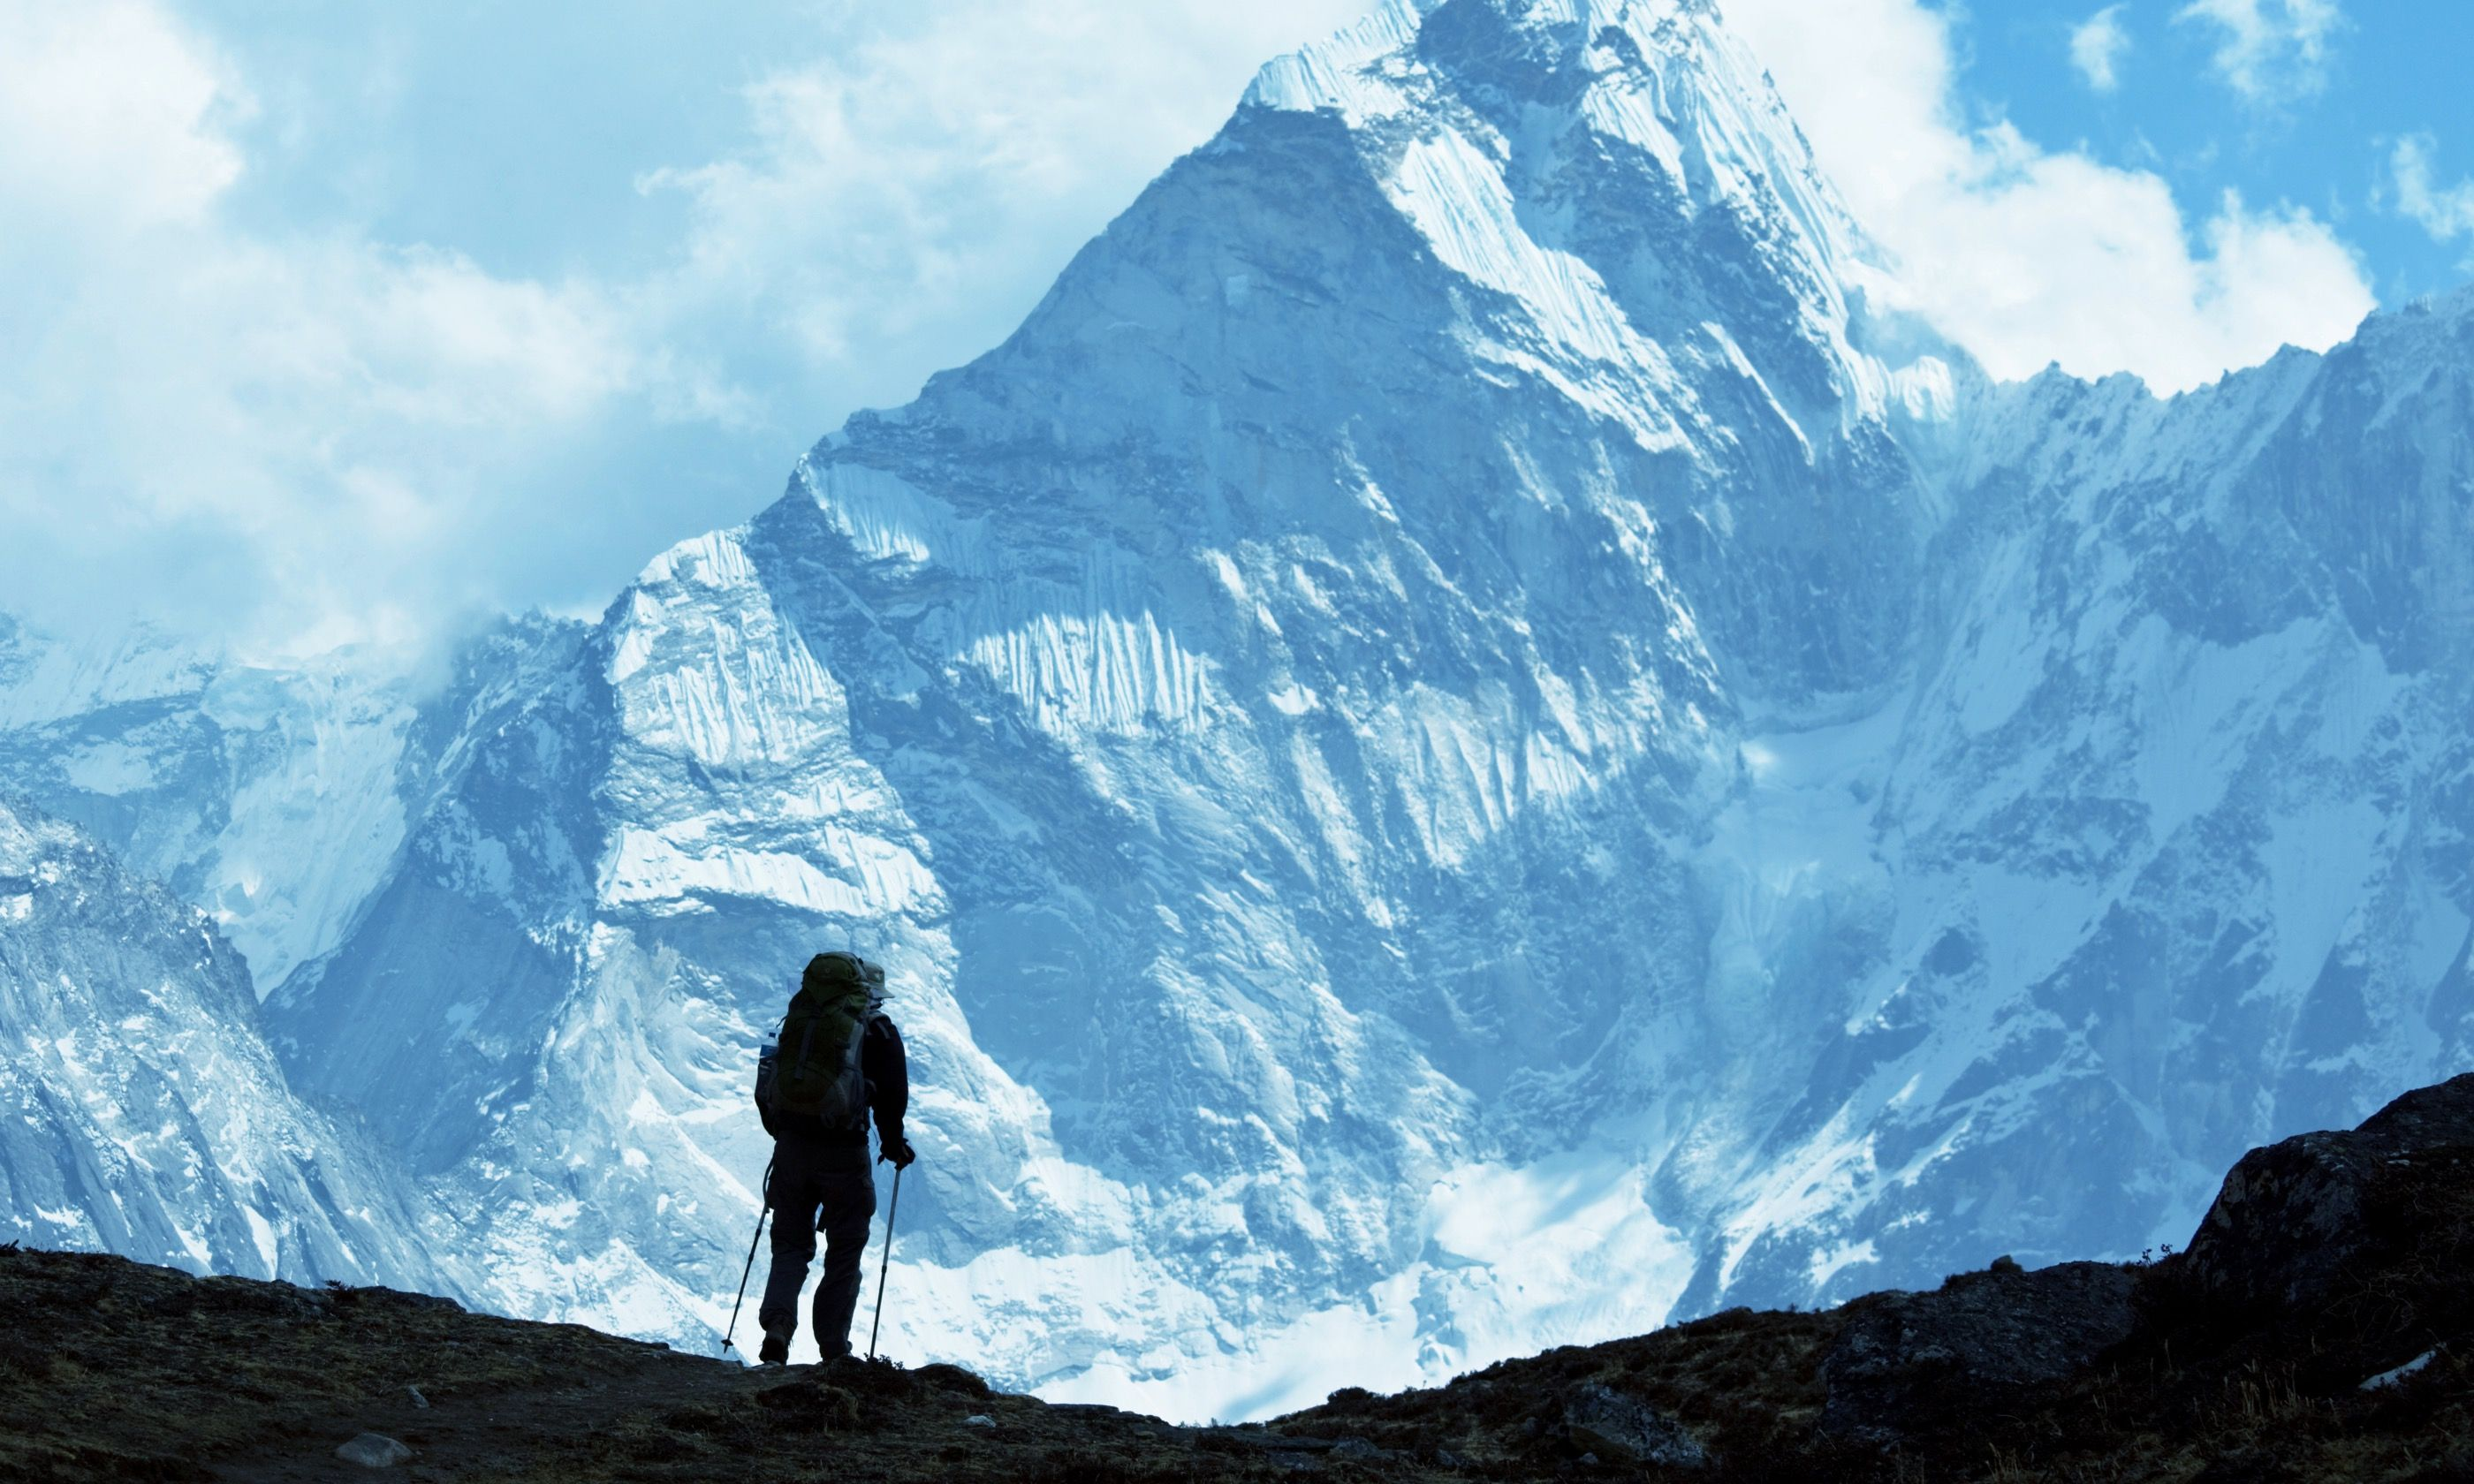 Climber in Himalaya (Shutterstock.com)